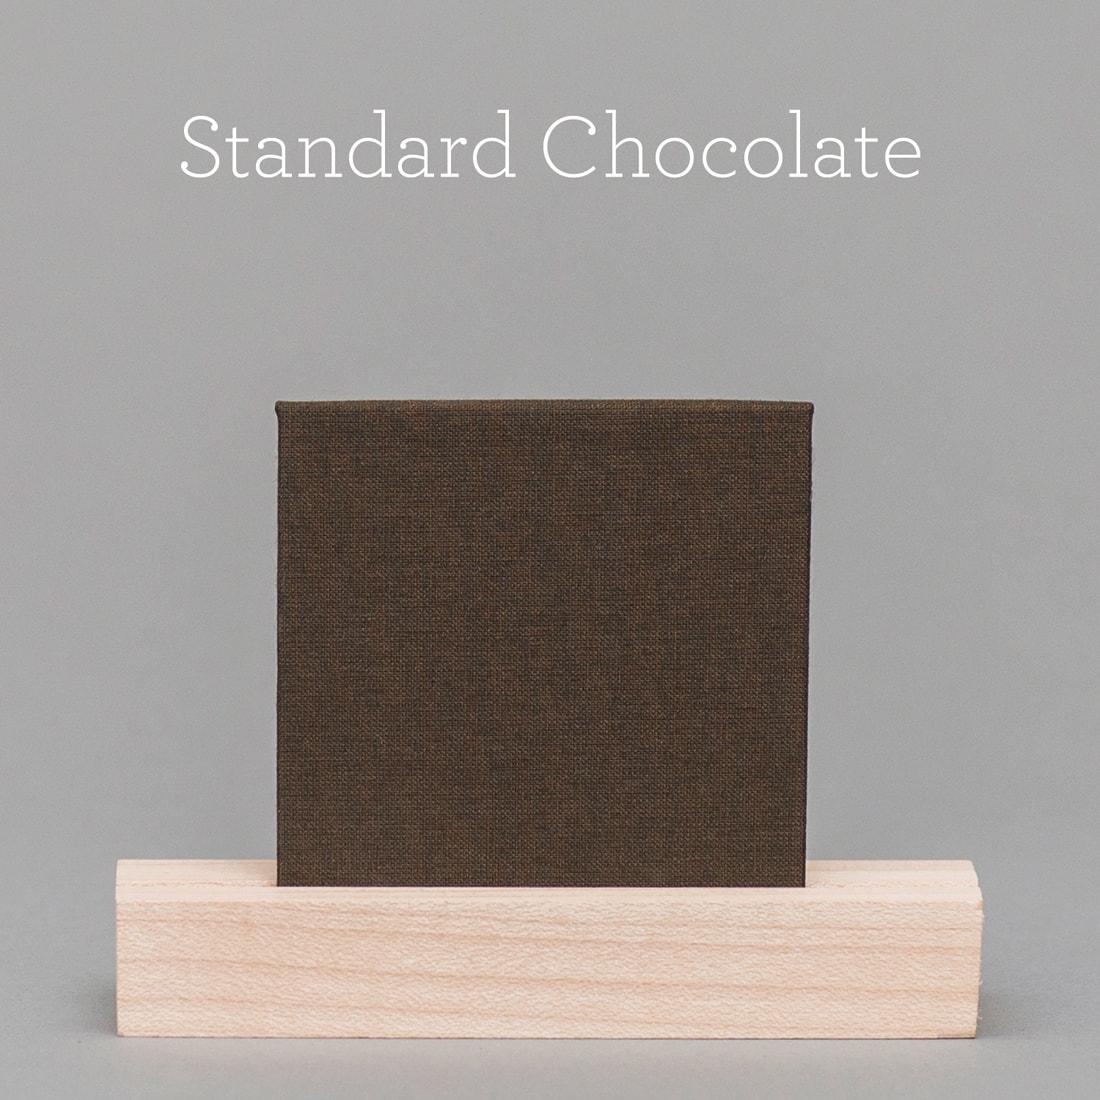 StandardChocolate